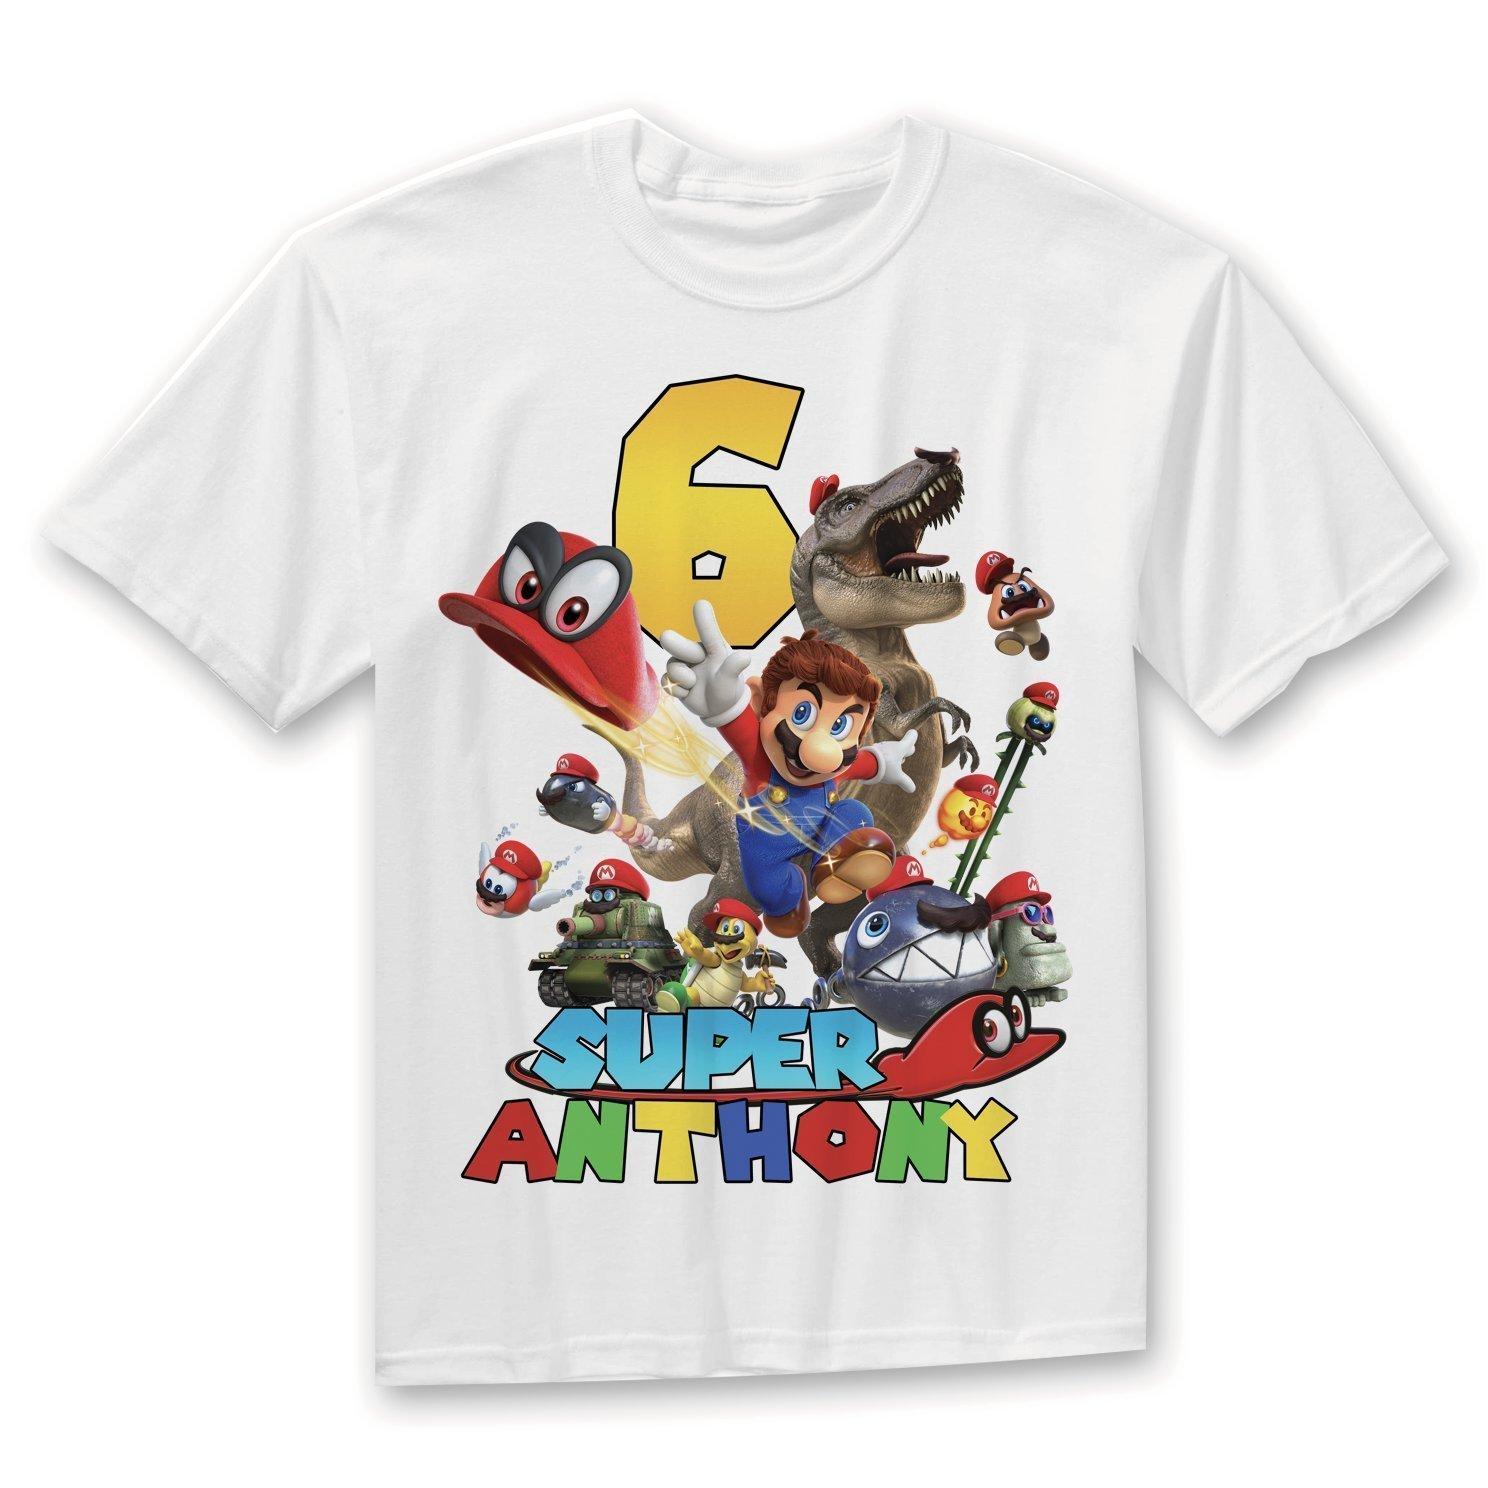 Super Mario Birthday Shirt, Mario Odyssey Birthday Shirt, Super Mario Odyssey Party, Personalized Birthday t-shirt, Custom Family Shirts